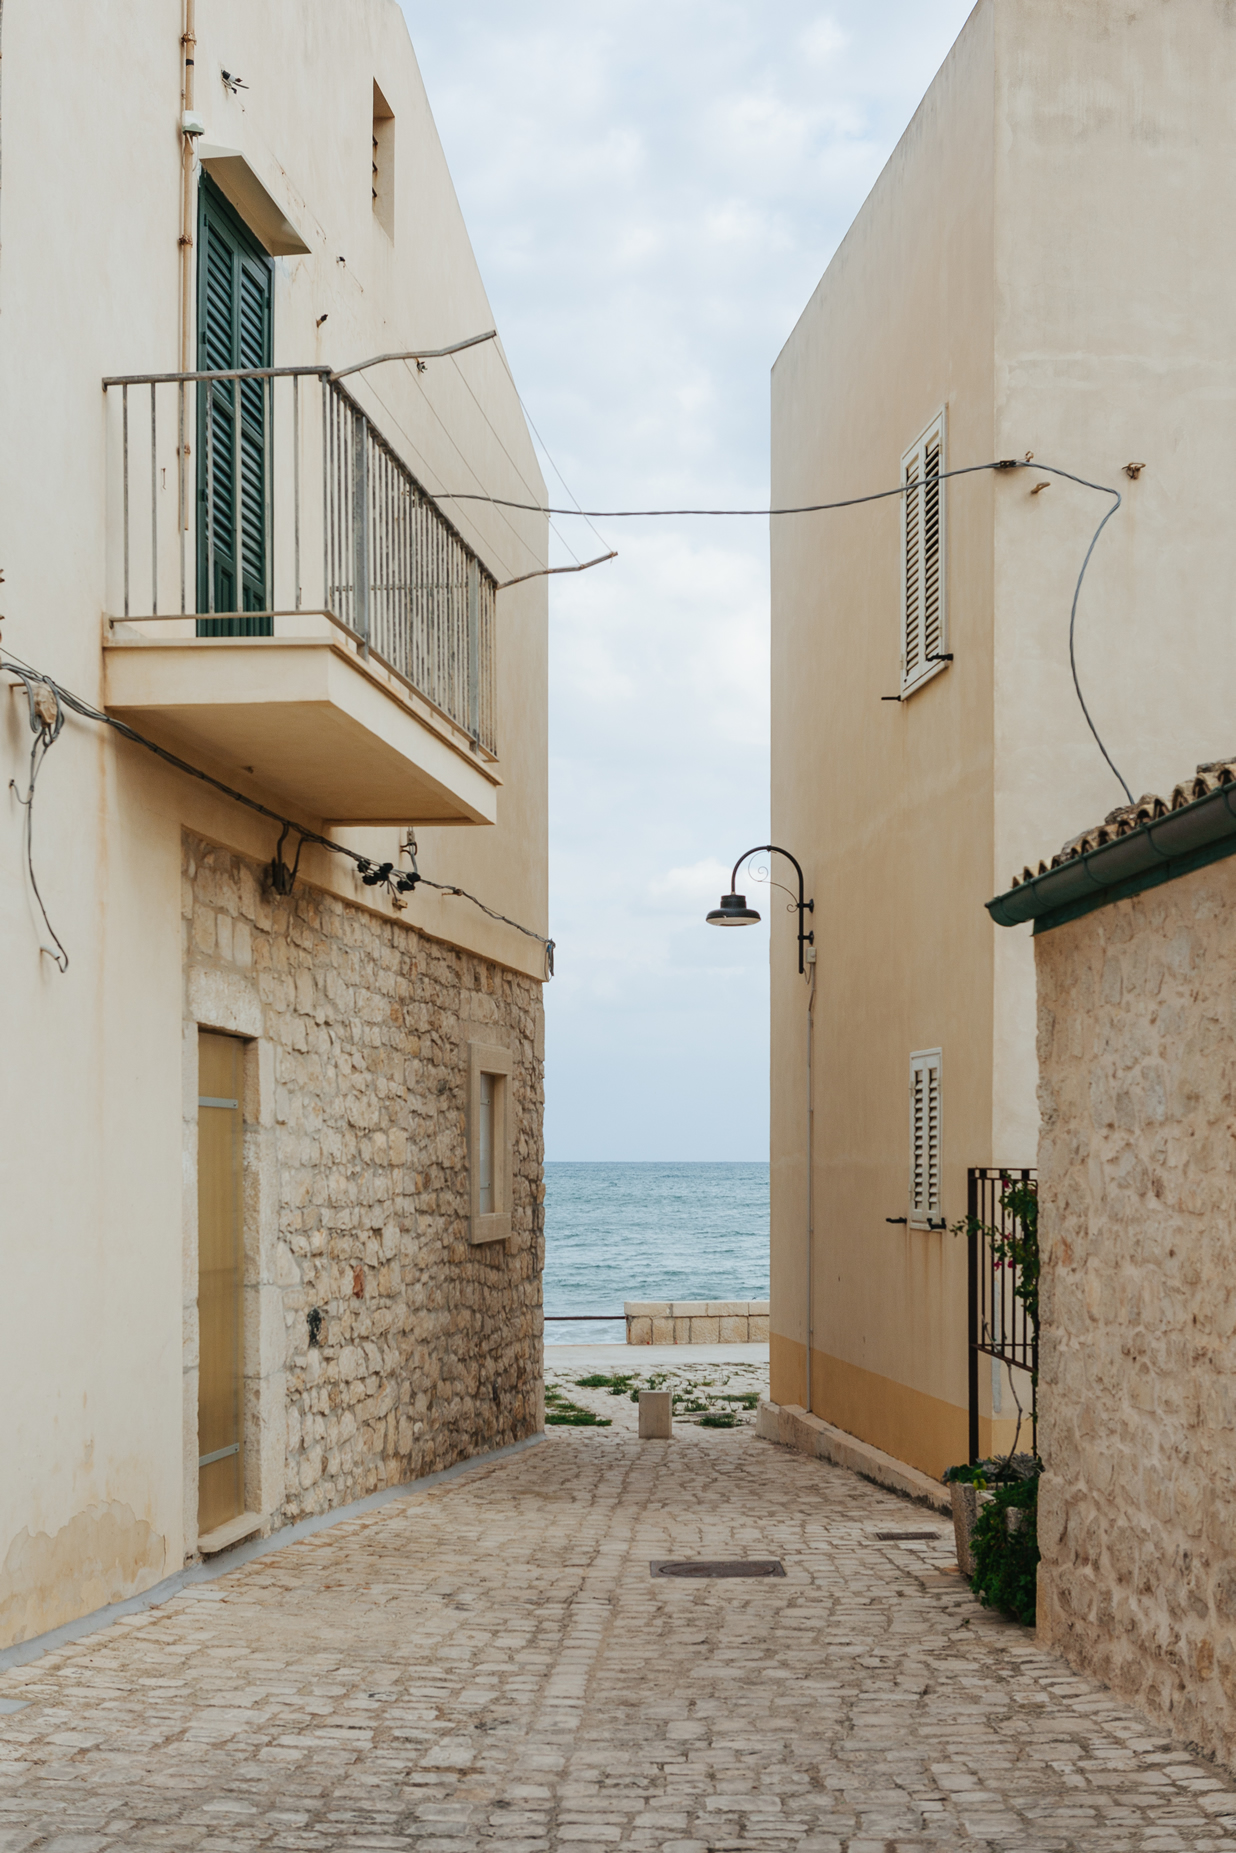 26sampieri-casa-vacanze-sicilia-appartamento-sicily-holiday-apartment-casa-del-pescatore-italia-italy.jpg